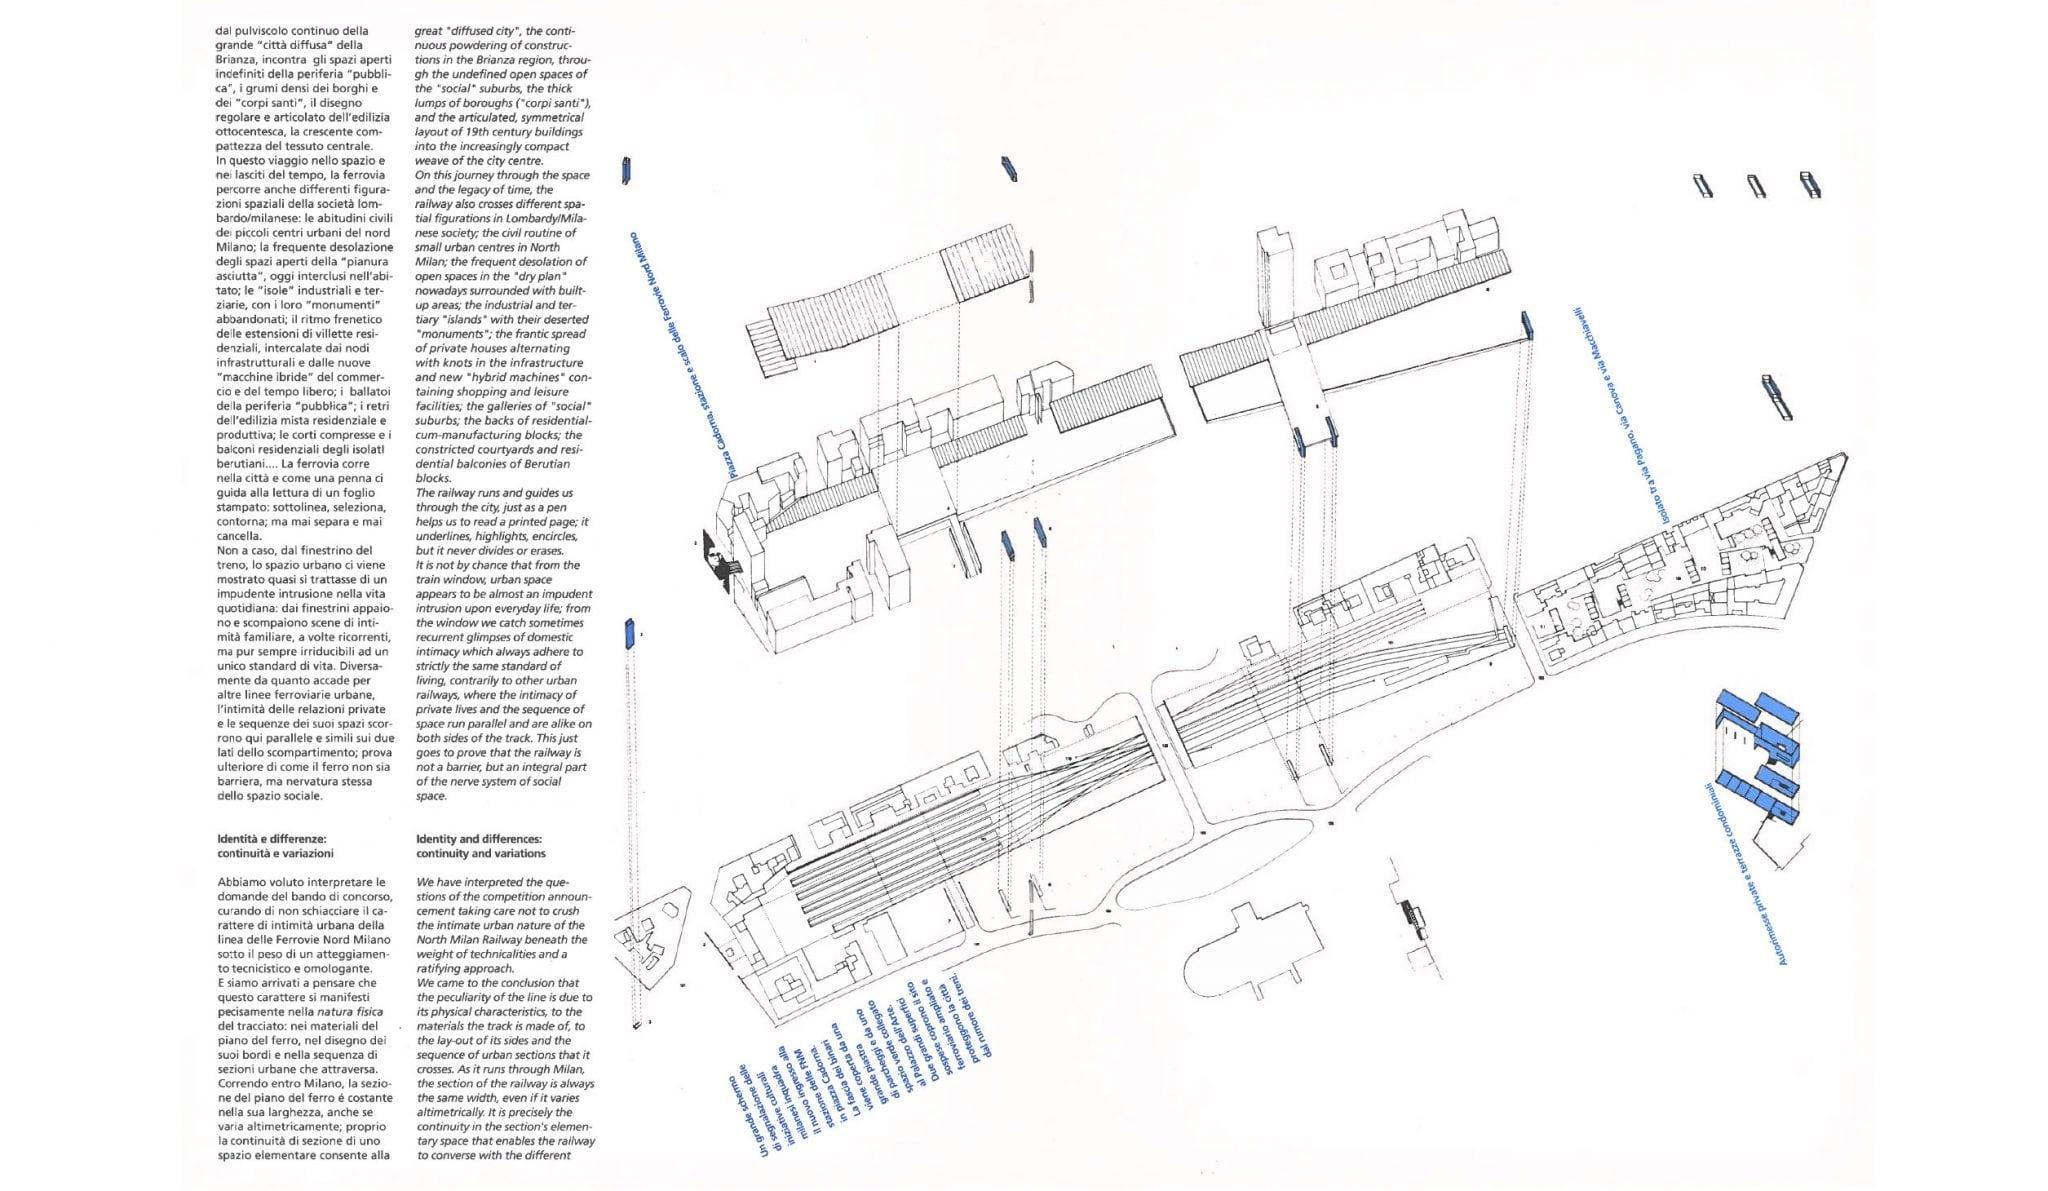 Railway Alphabet Stefano Boeri Architetti